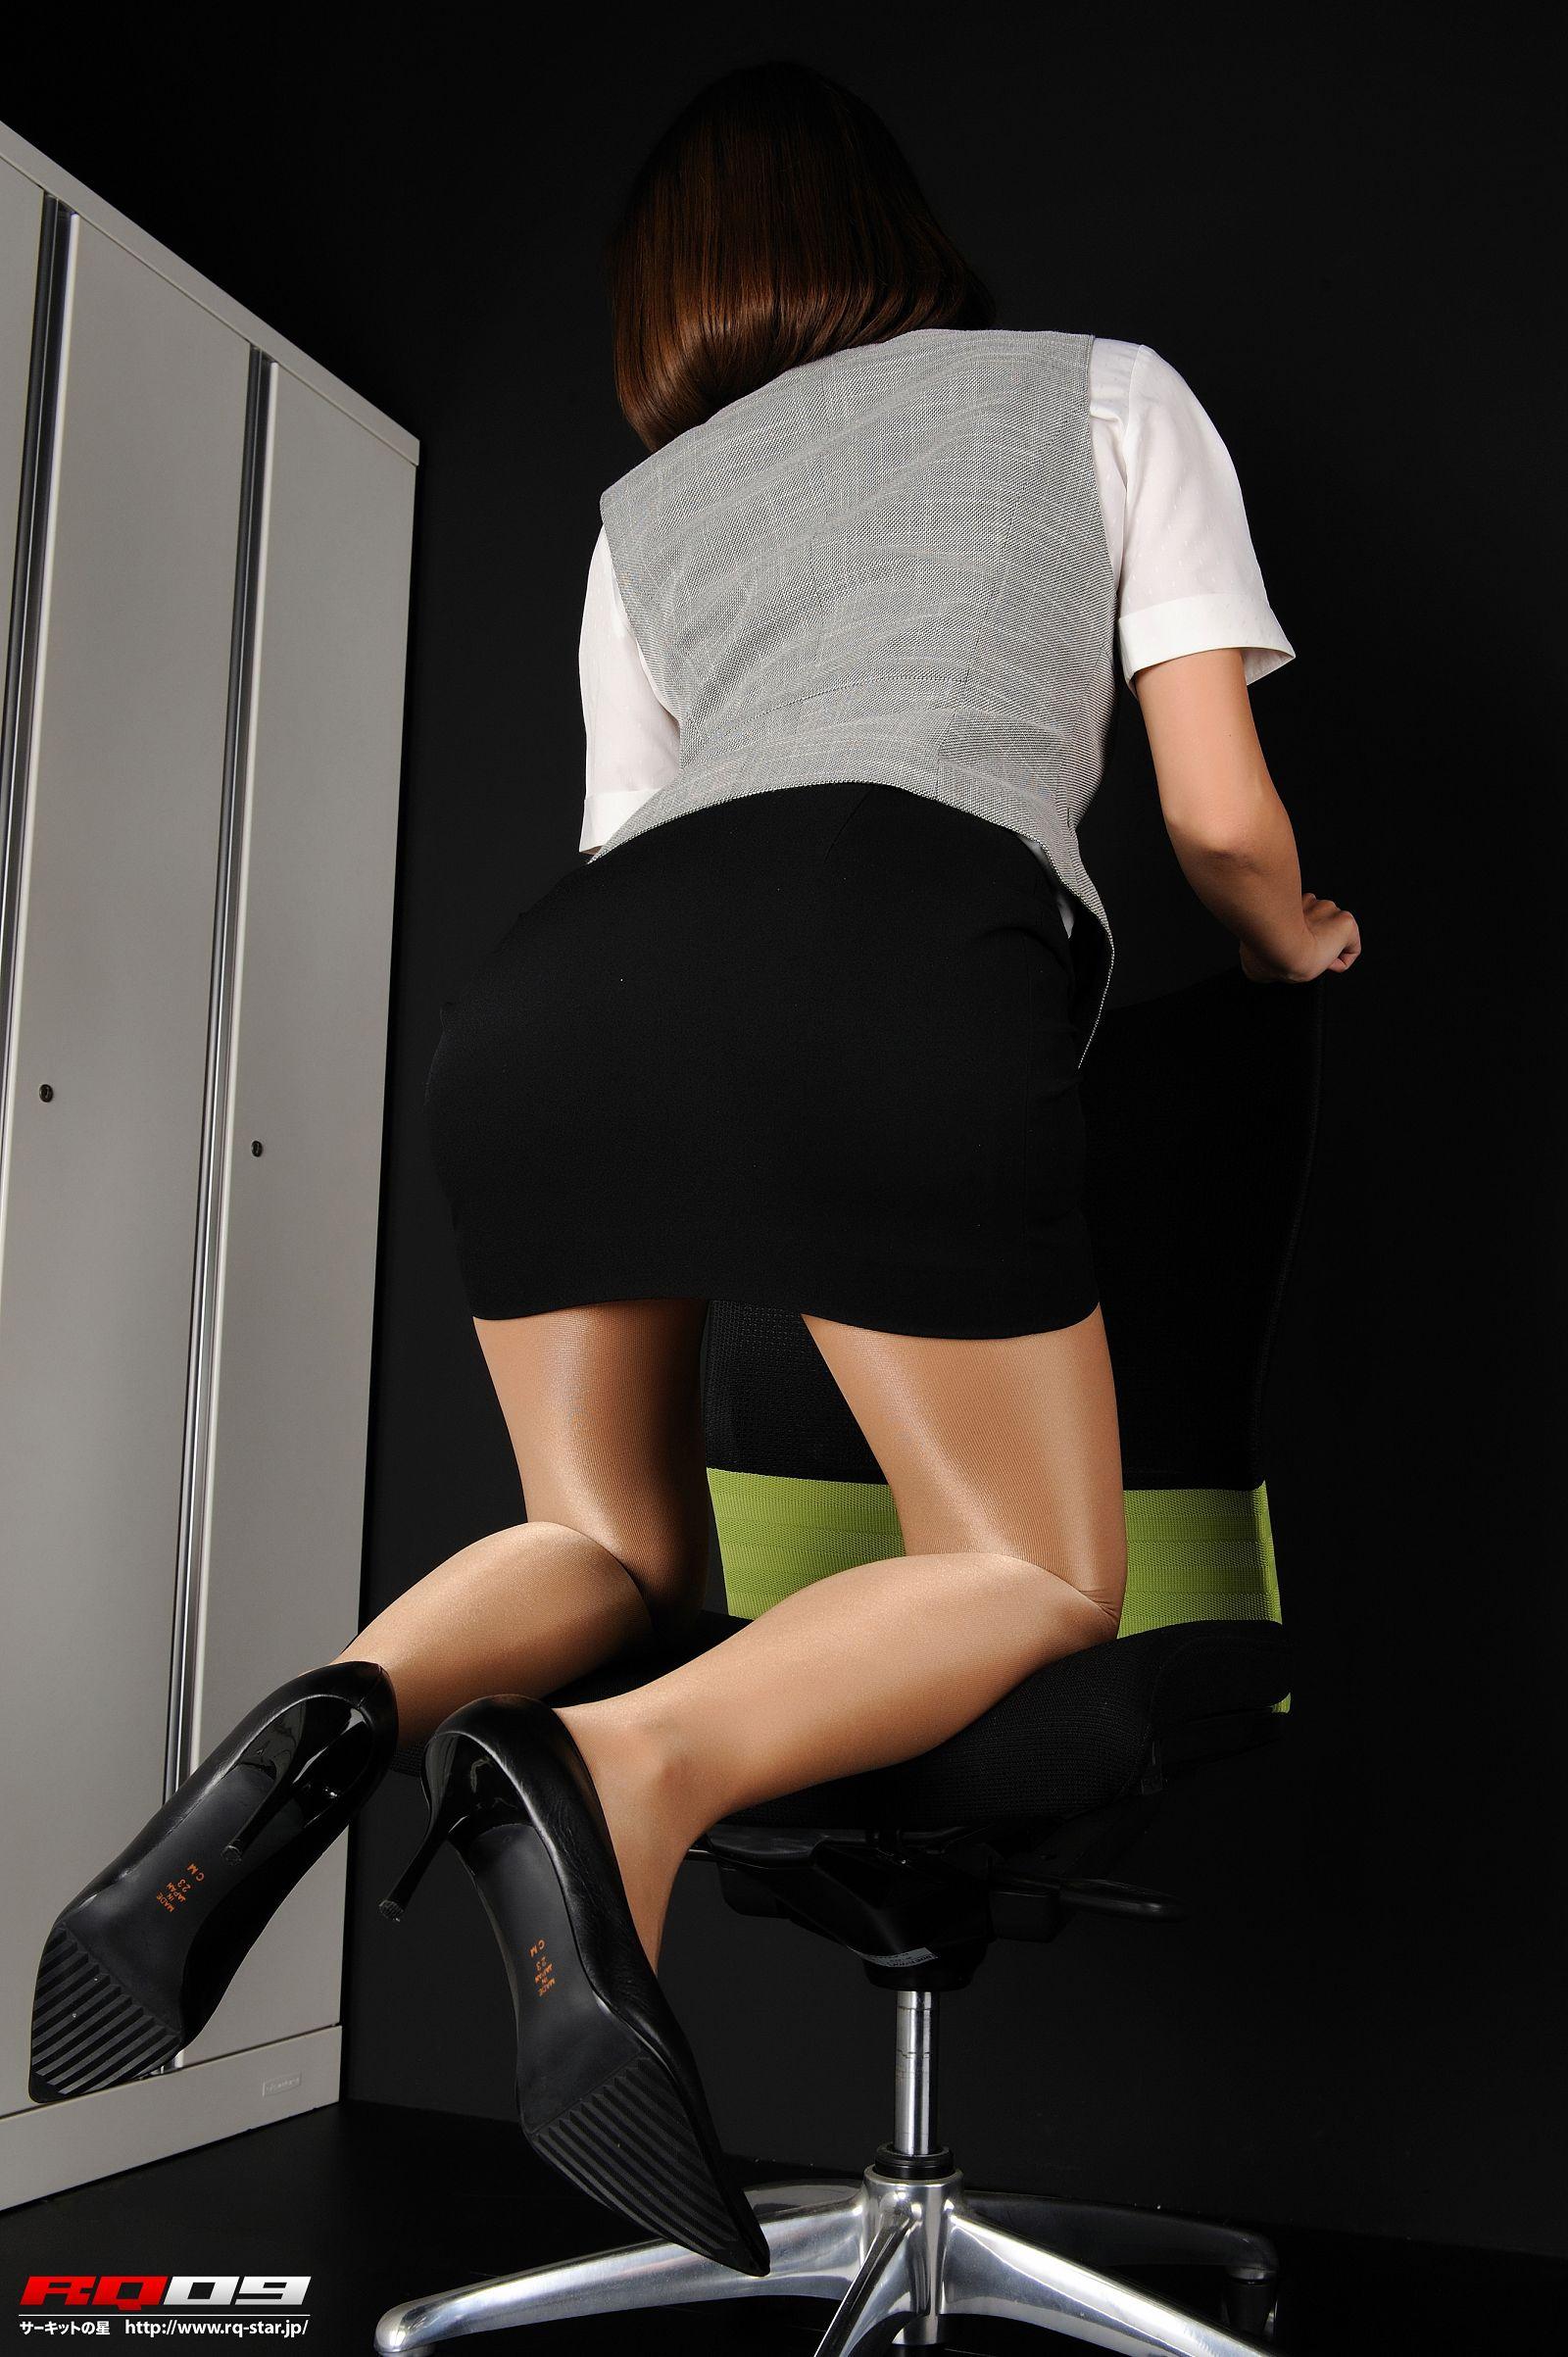 [RQ STAR美女] NO.0223 Erika Mostardini モスタルディーニエリカ Office Lady[110P] RQ STAR 第4张